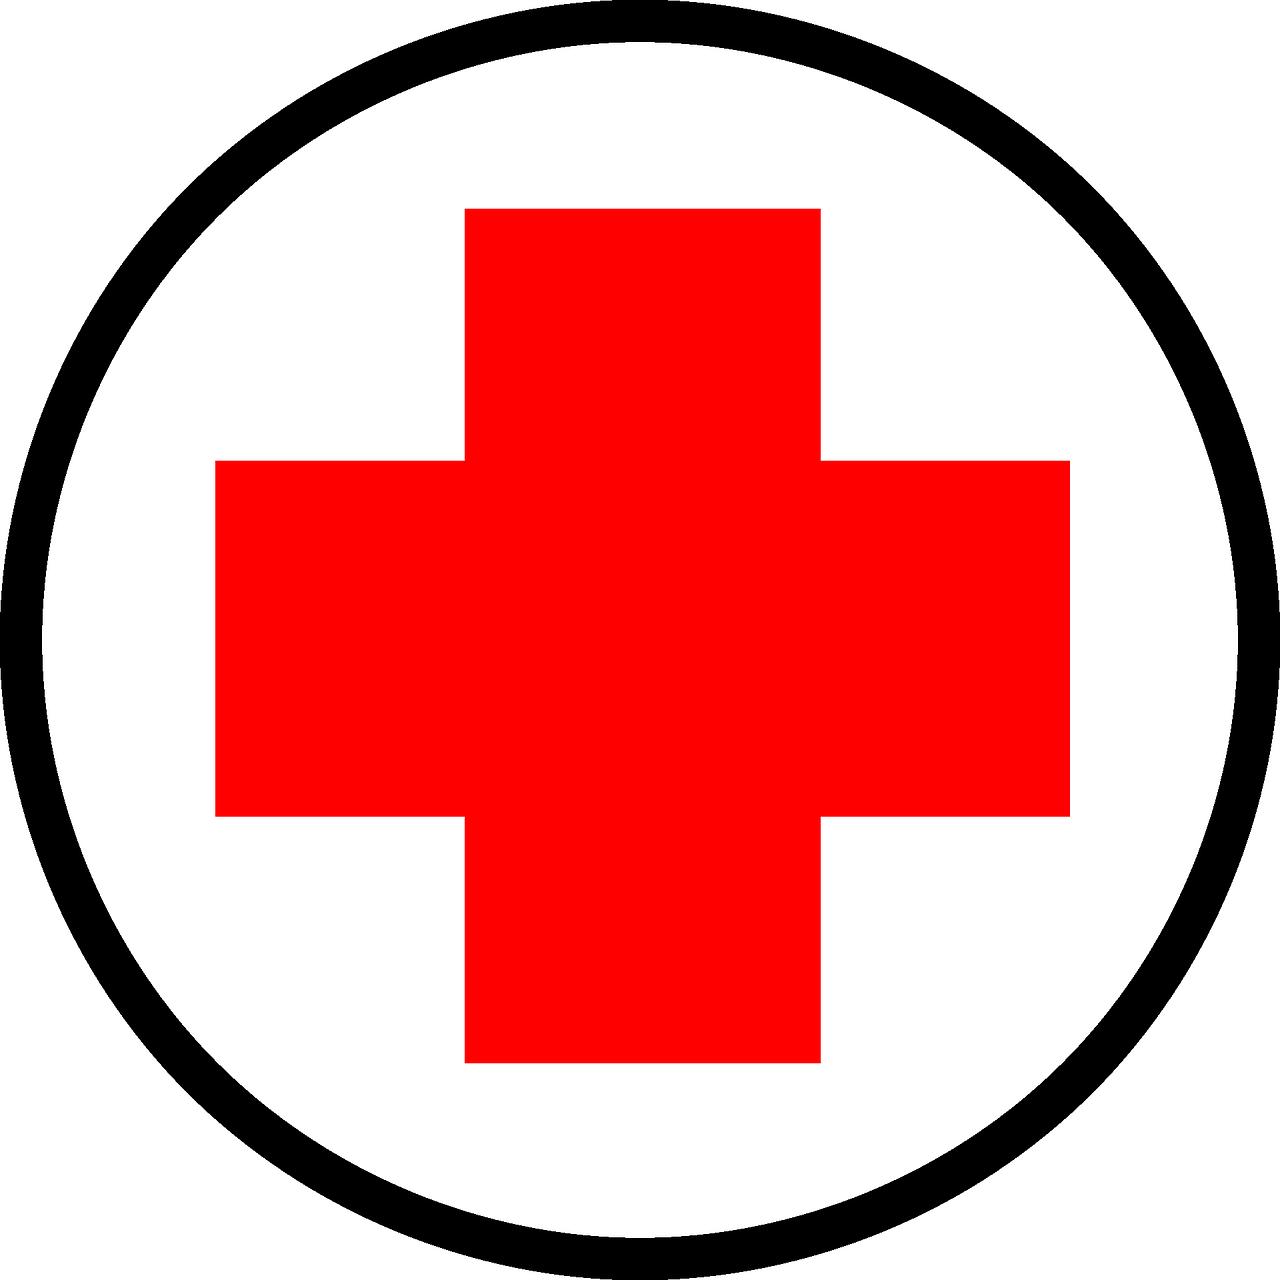 Знак медицины картинки 6